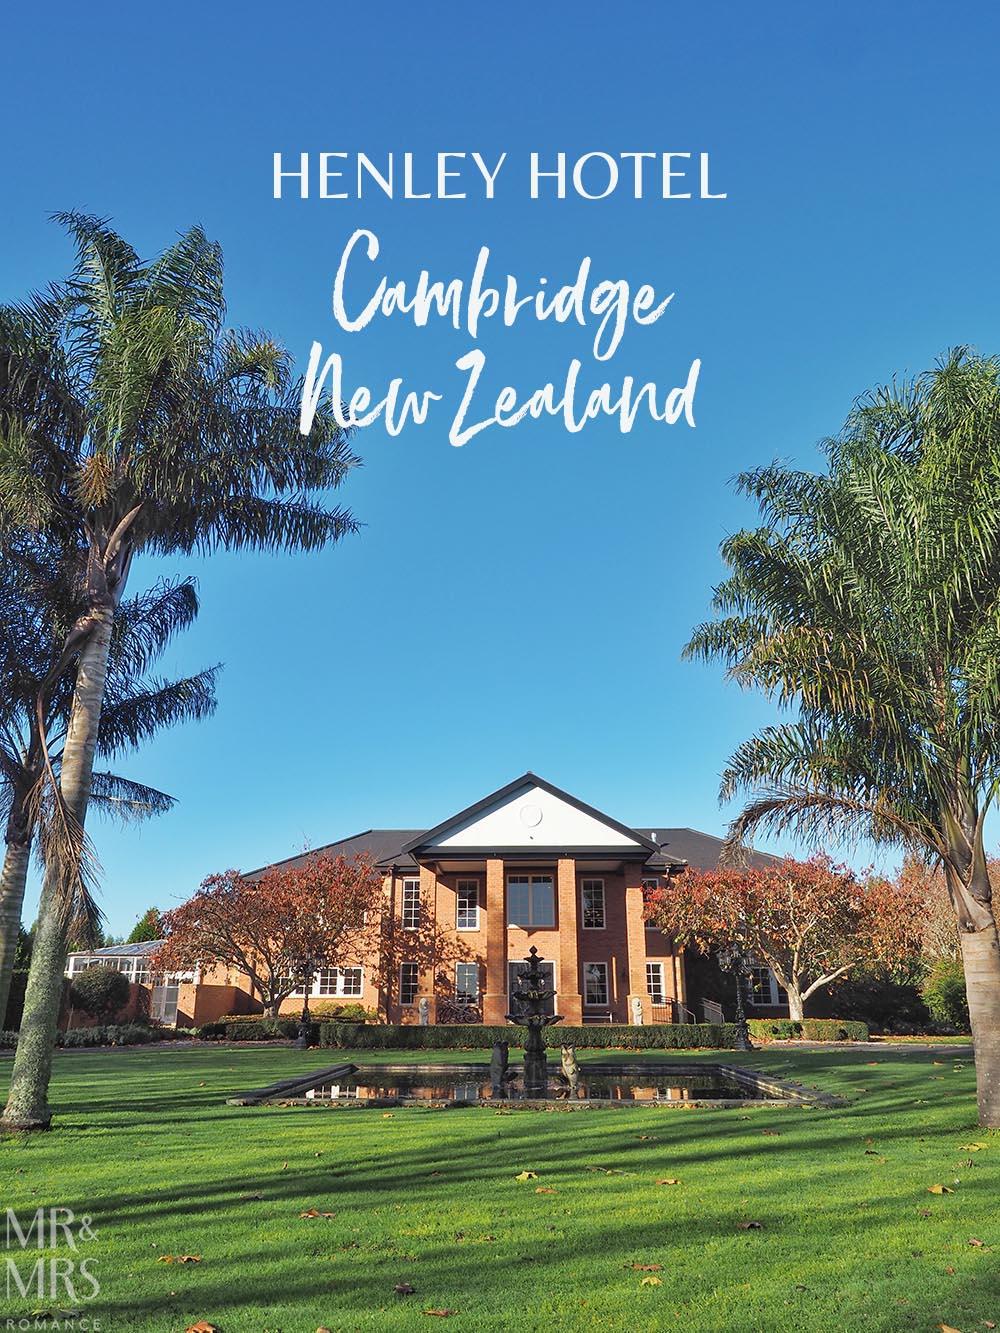 Henley Hotel, Cambridge, New Zealand